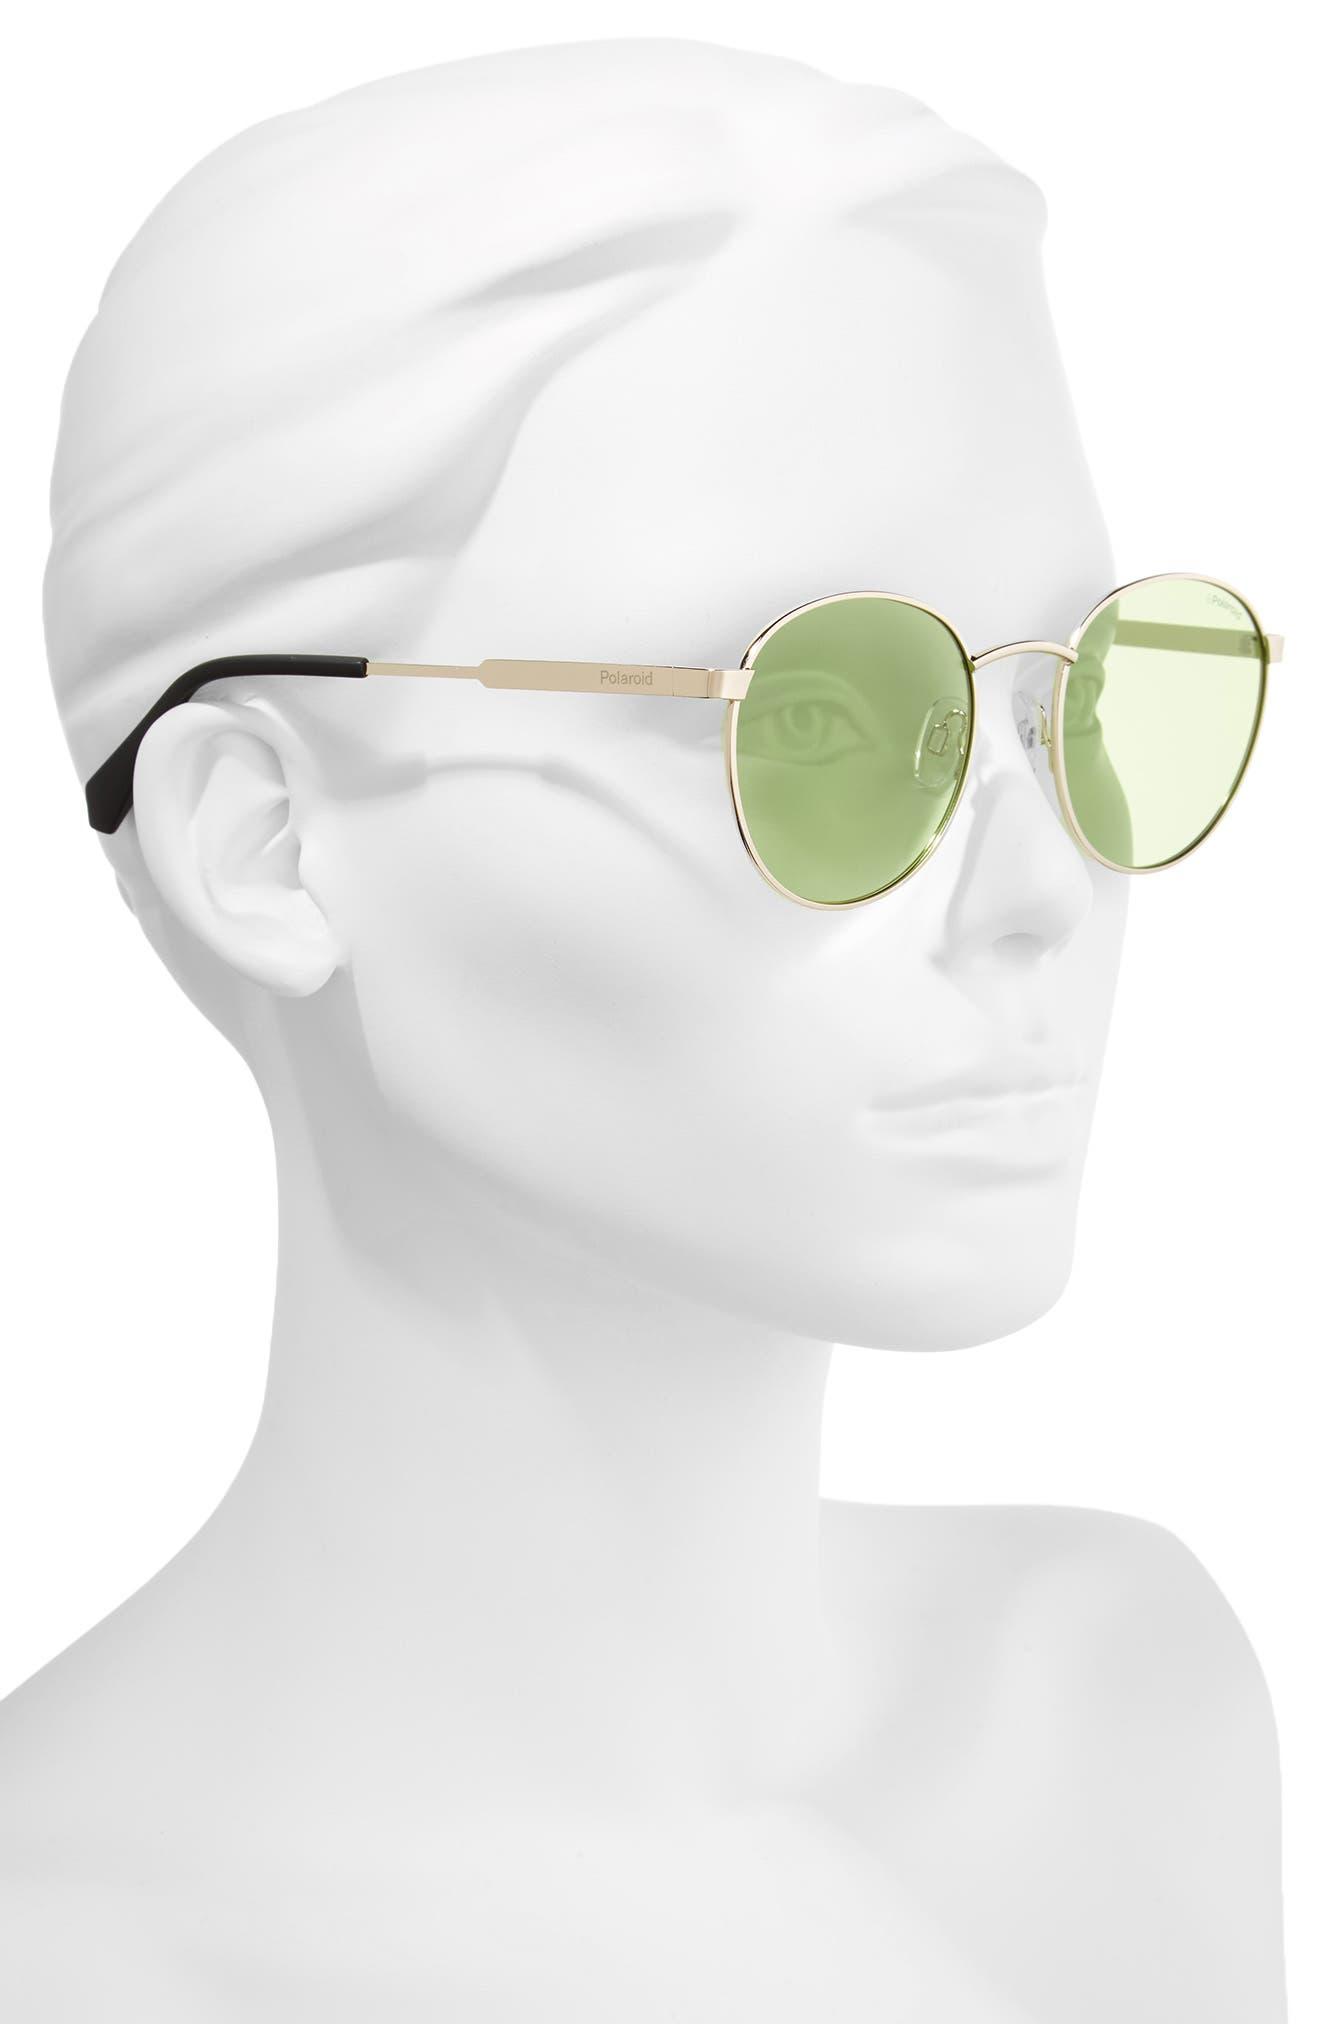 51mm Round Retro Polarized Sunglasses,                             Alternate thumbnail 2, color,                             300